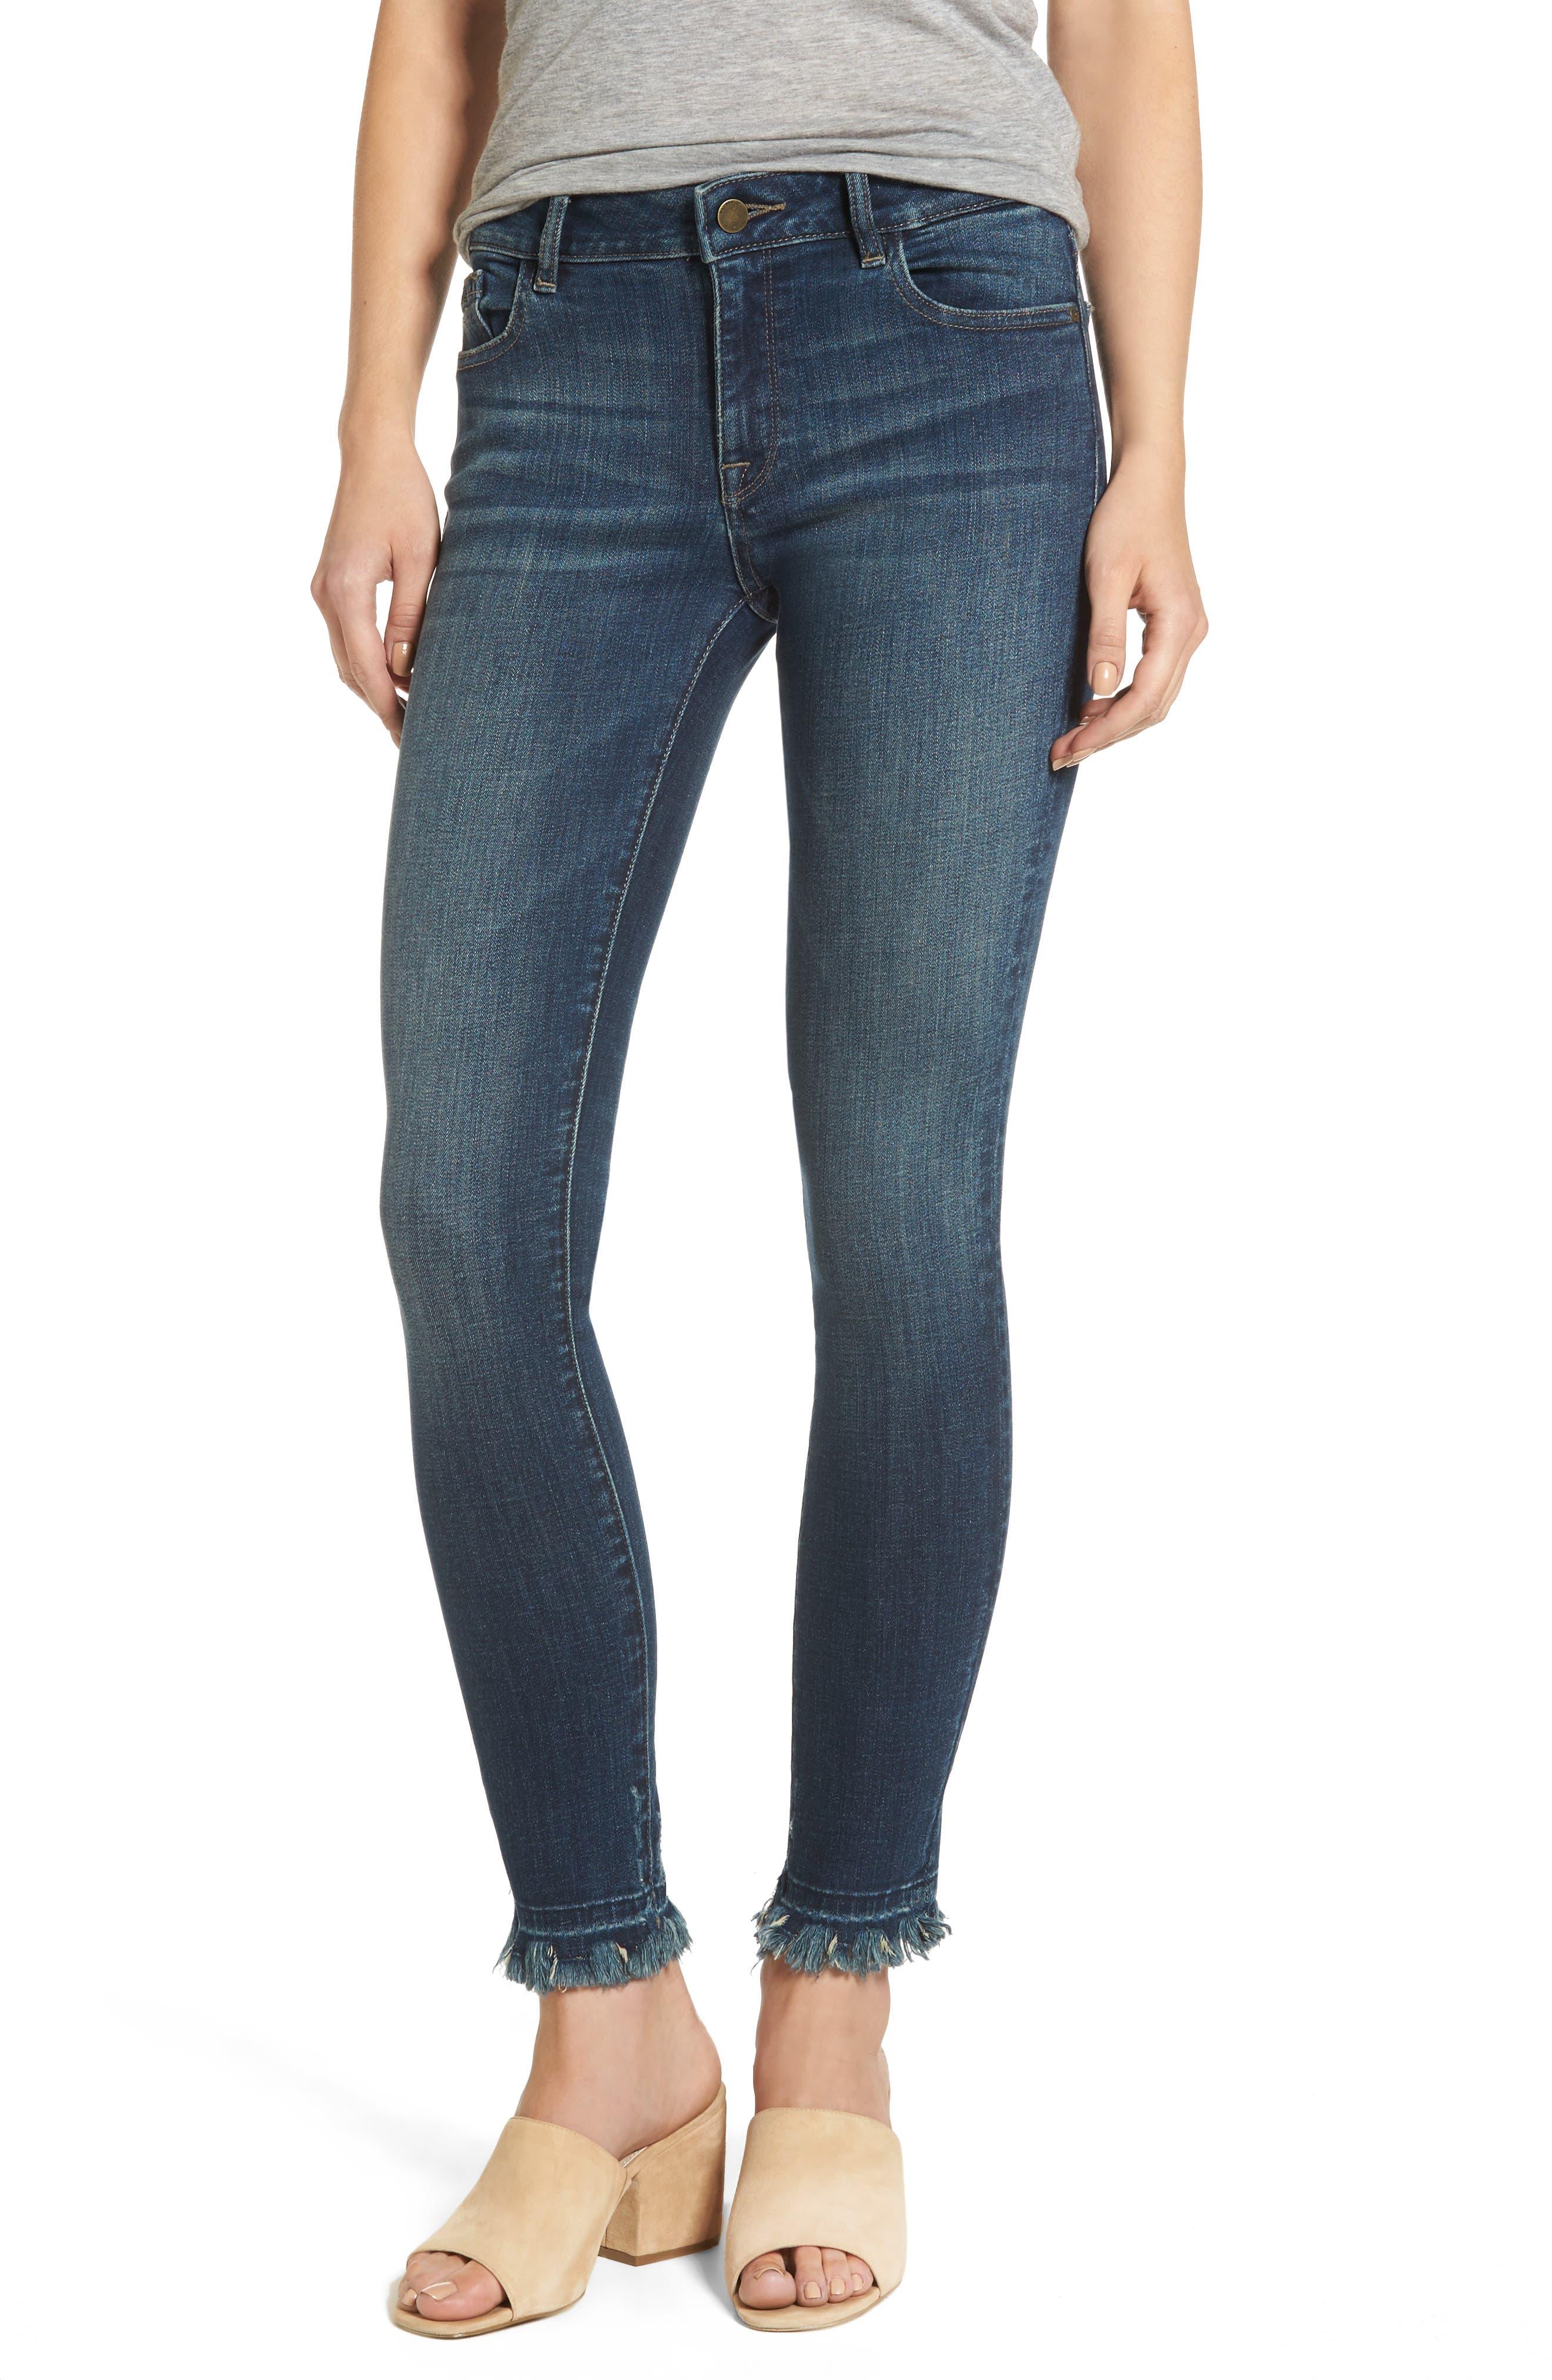 Alternate Image 1 Selected - DL1961 Margaux Instasculpt Ankle Skinny Jeans (Harlow)